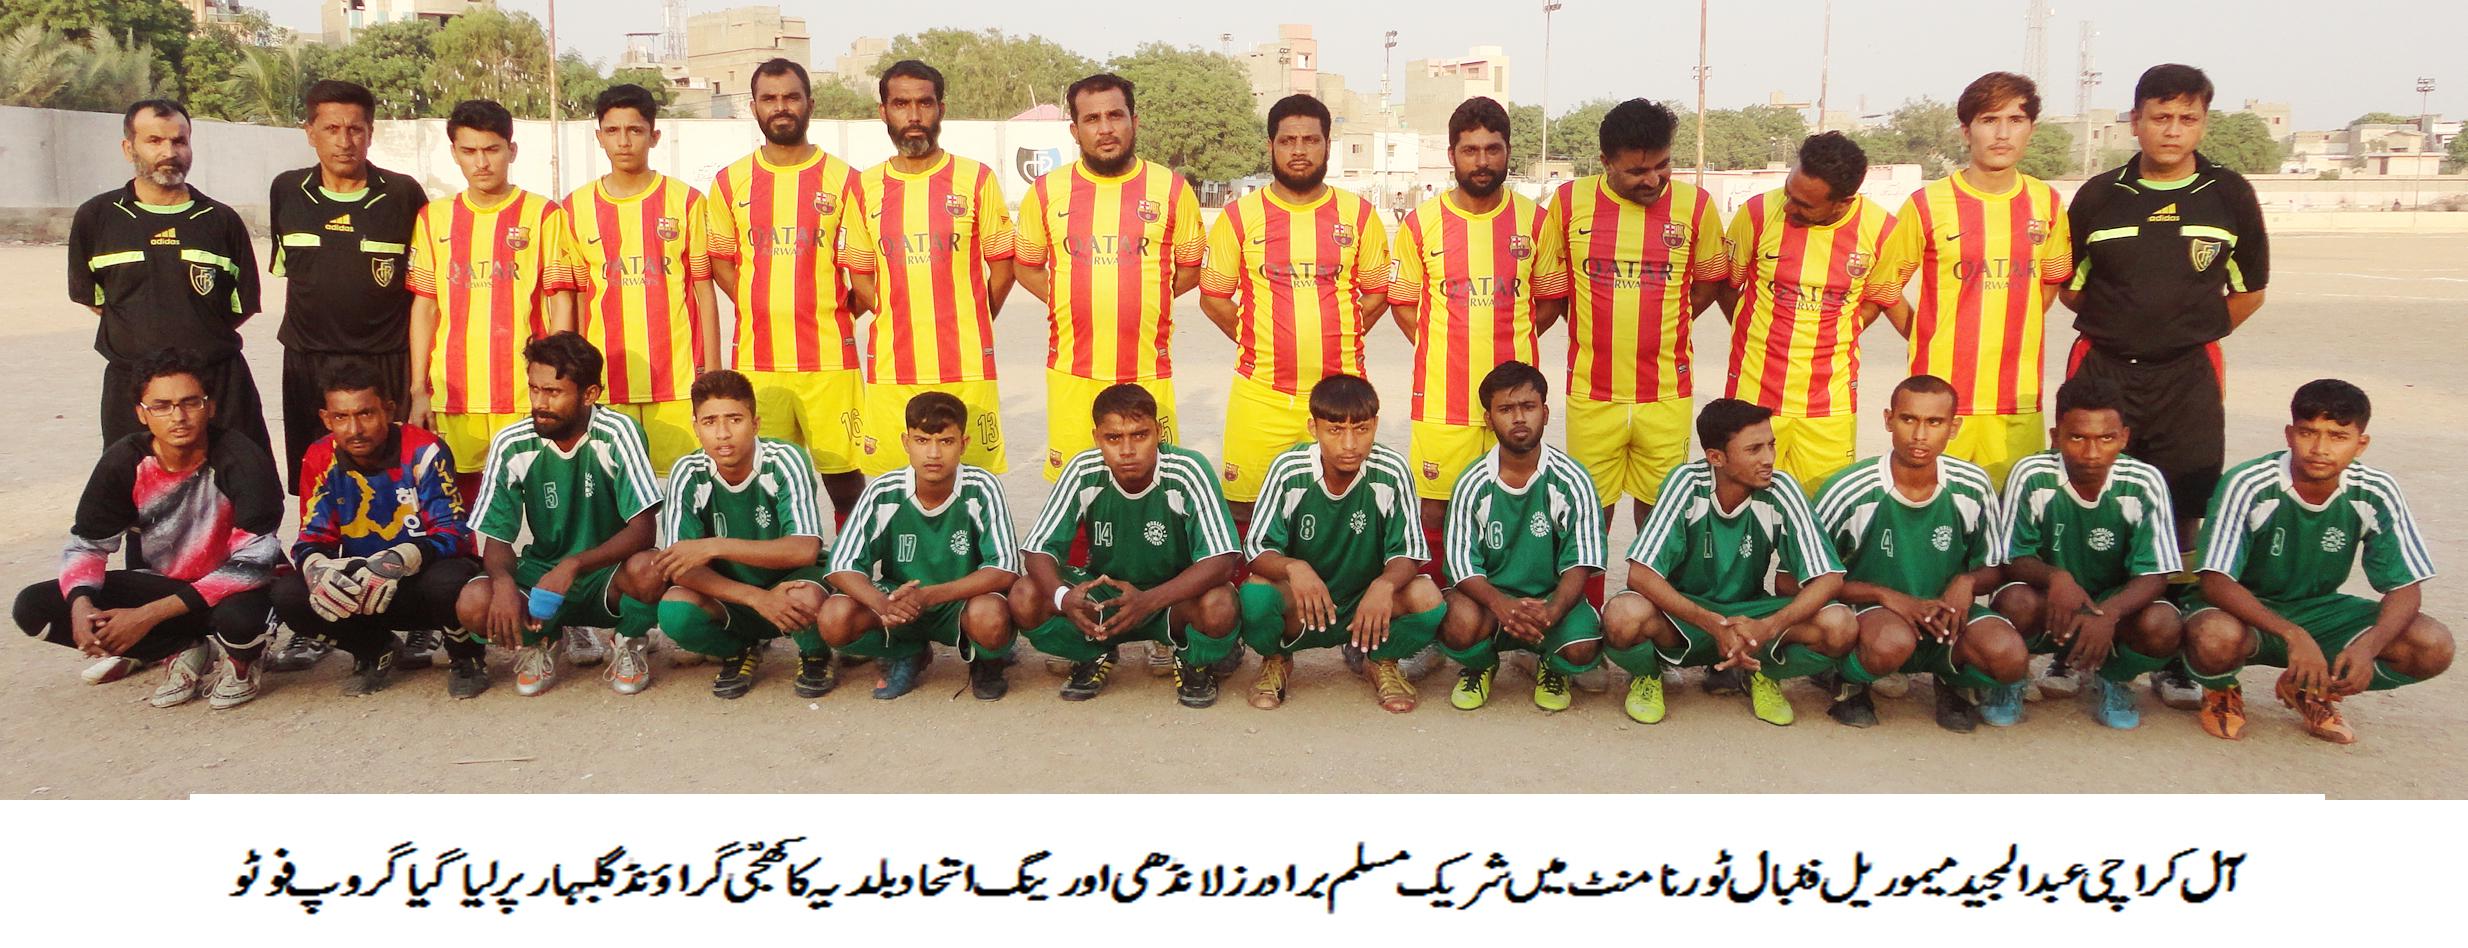 All-Karachi Abdul Majeed Football Tournament: Shama Sports Baldia, Eidgah Youth South and Karachi Friends grab wins